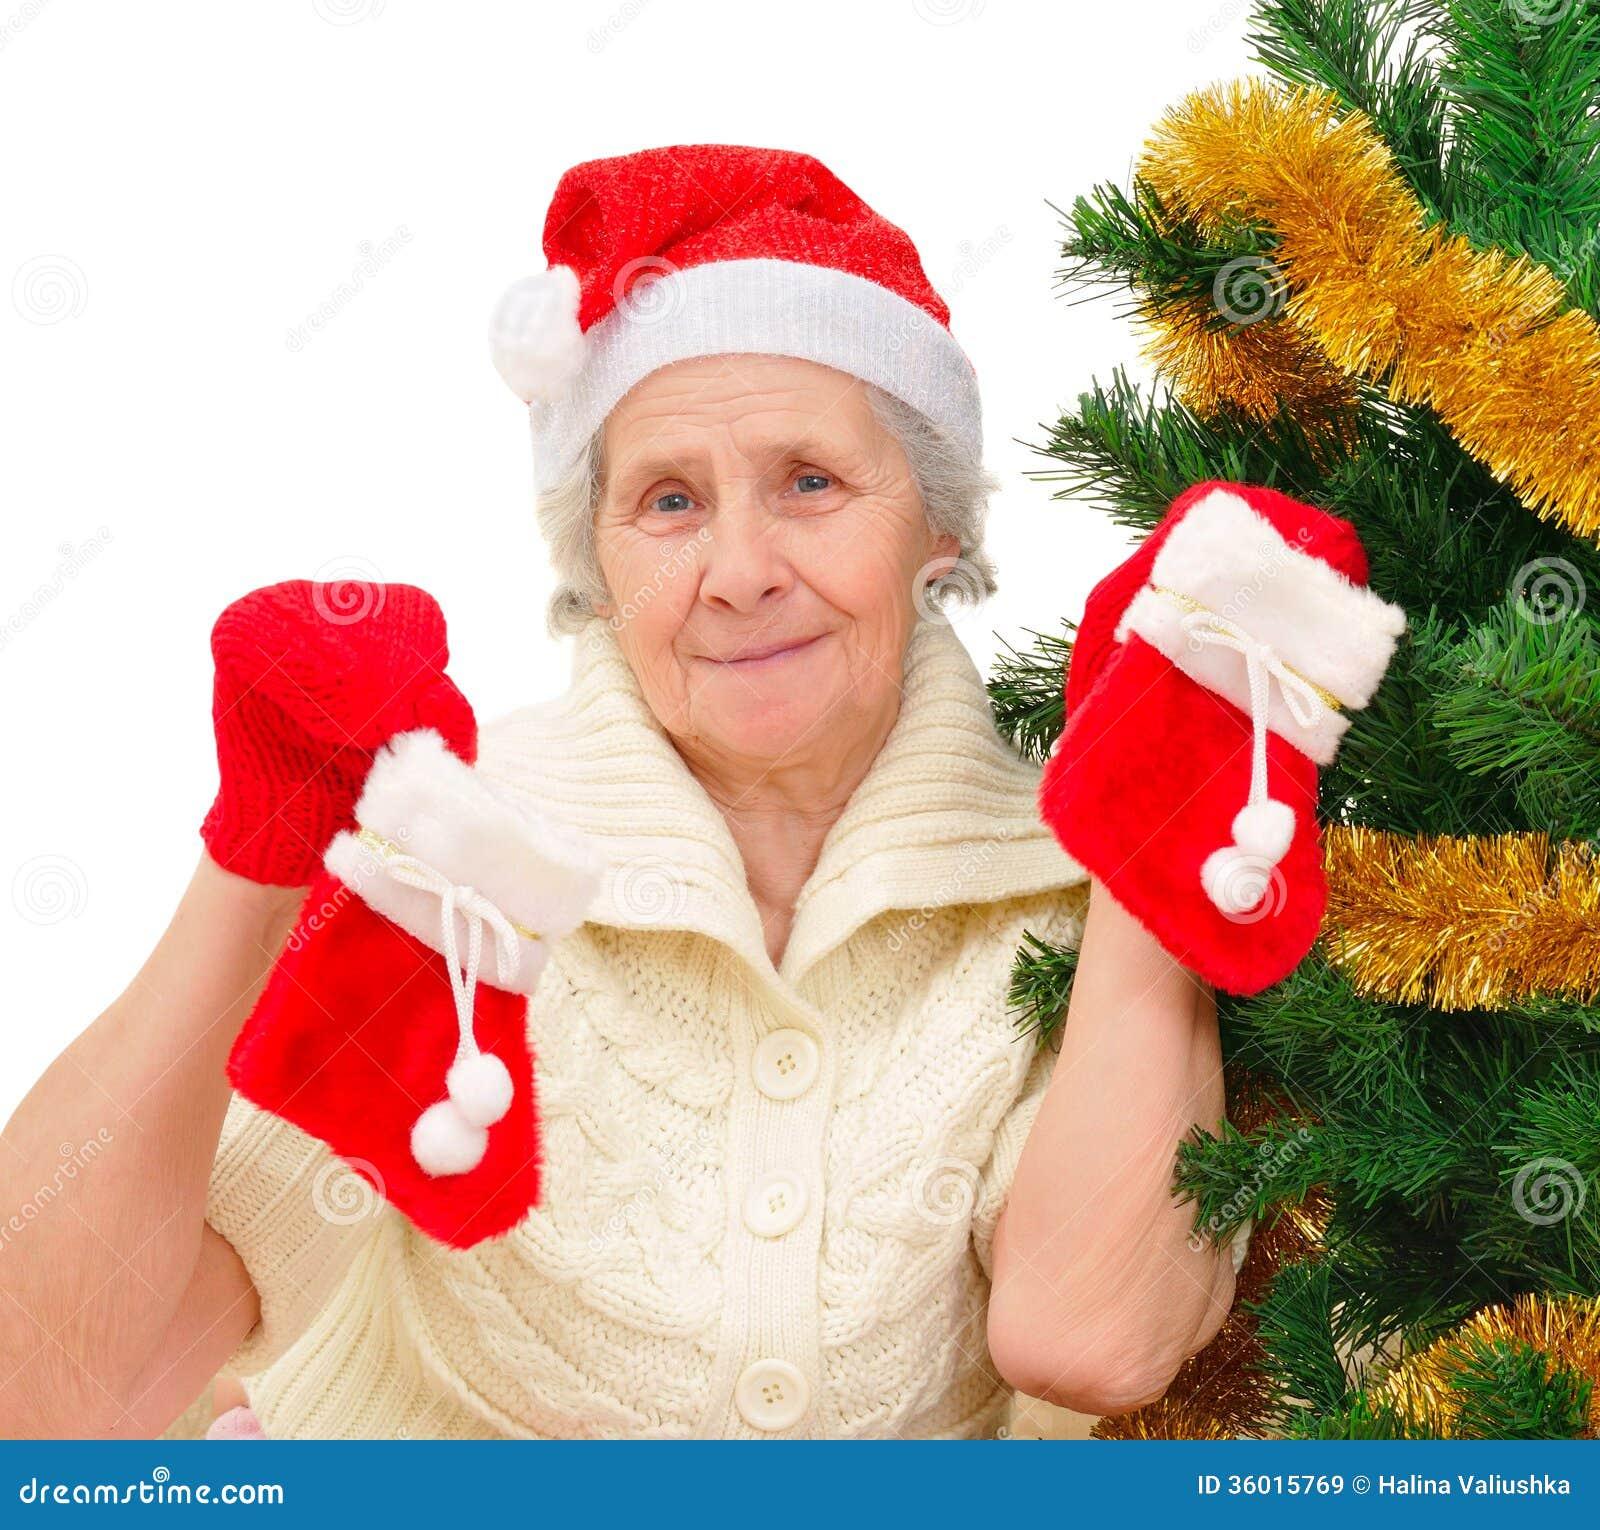 A happy christmas time at grandmas house